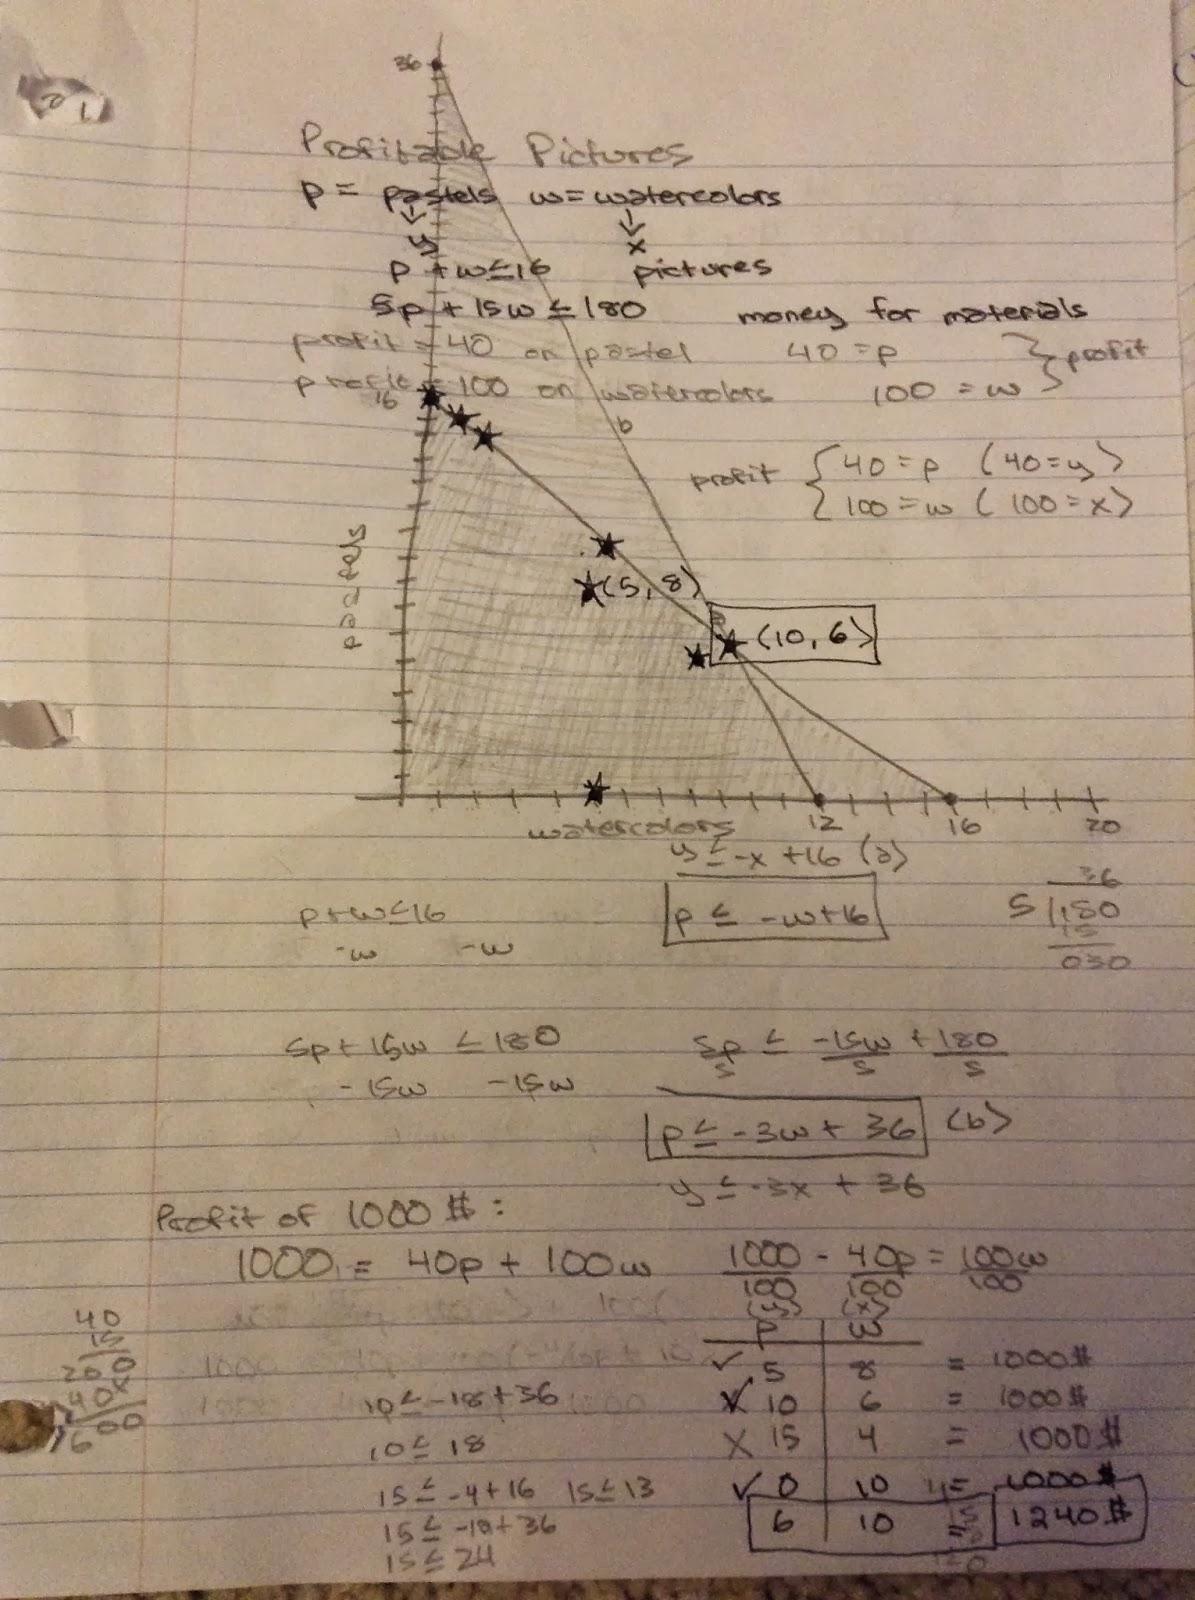 Math Portfolio Linnear Programming Profitable Pictures